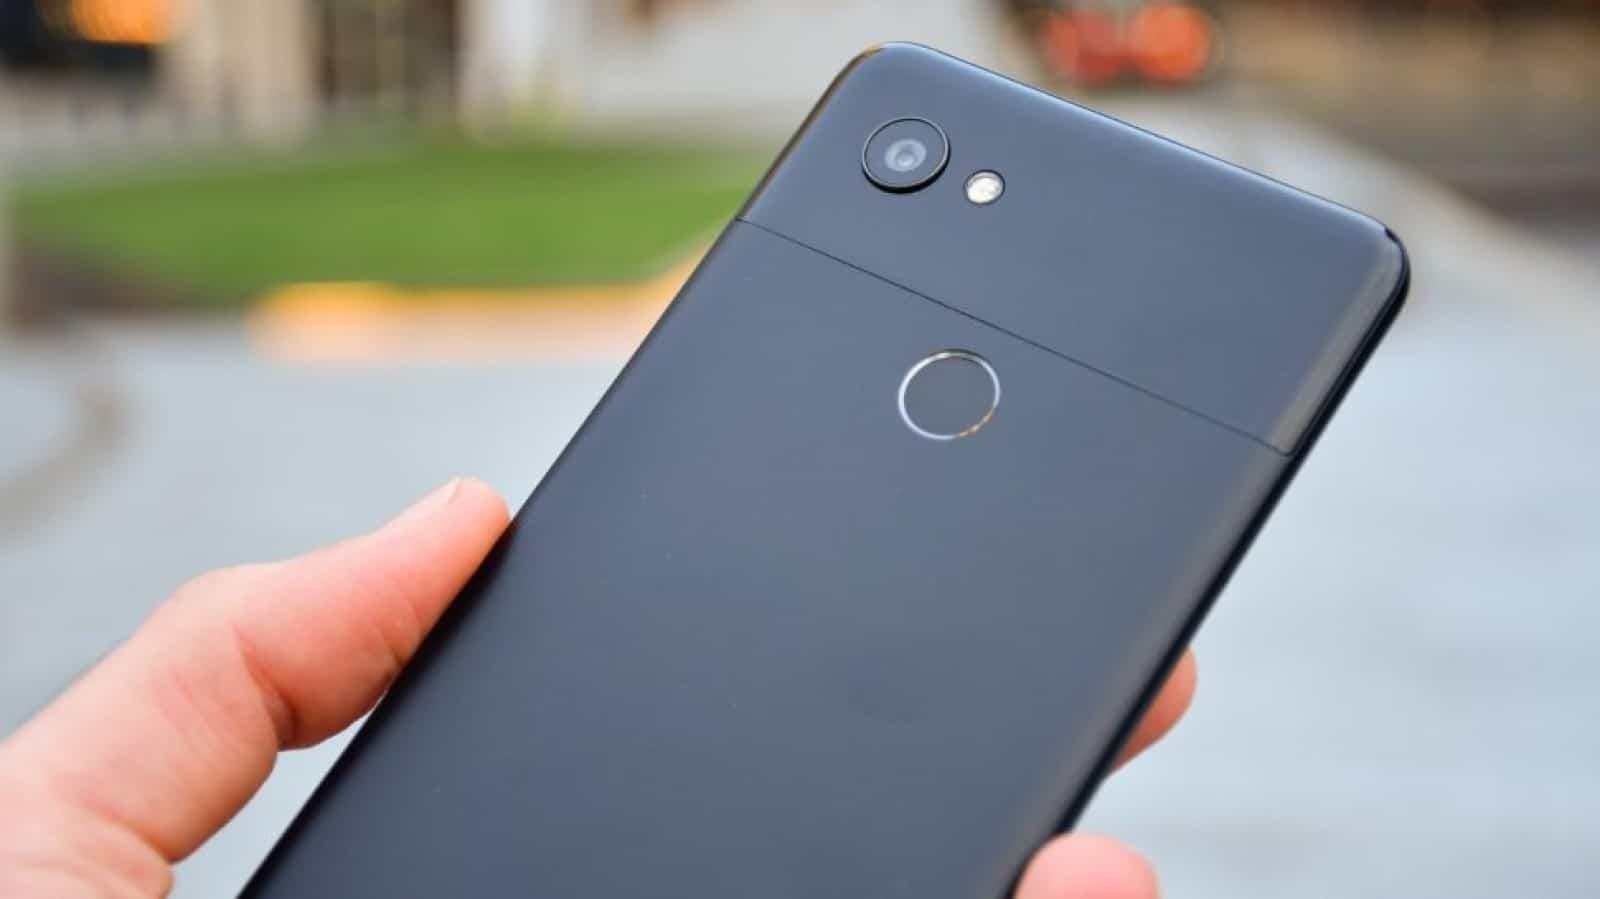 Google's Pixel 3 gets a kiss cam mode for its camera app